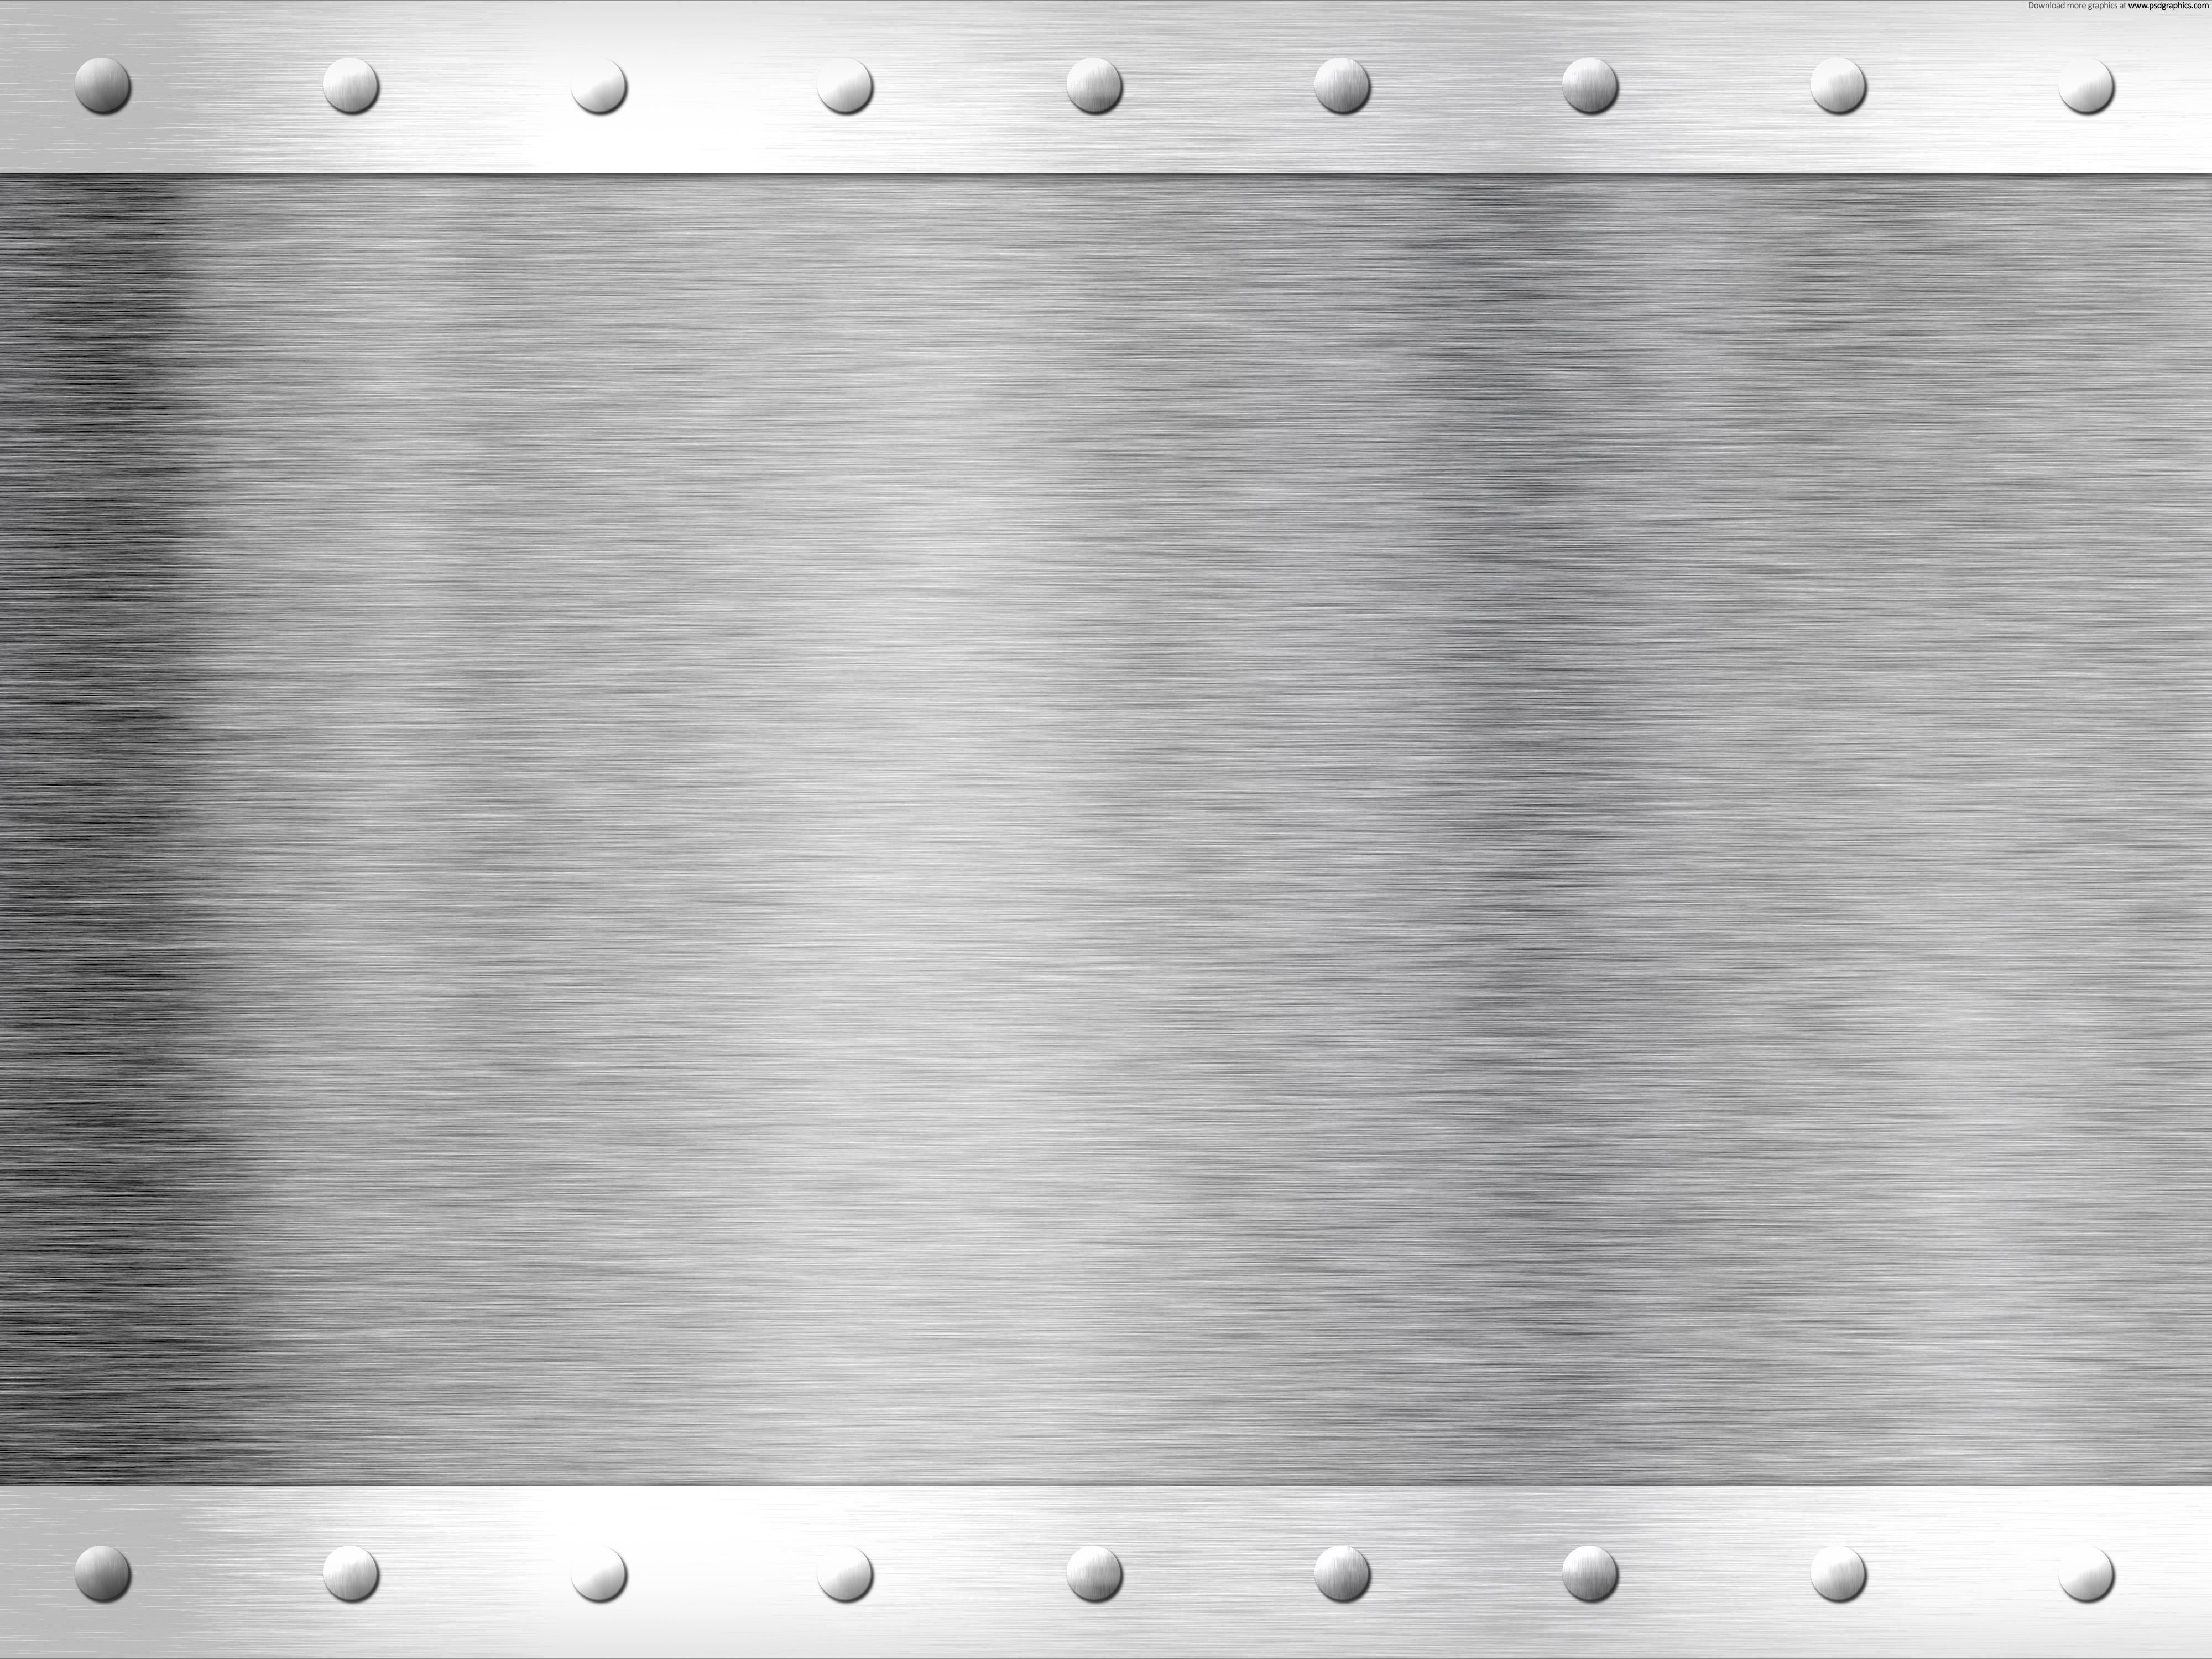 Silver Texture Photoshop Download imagebasketnet 4000x3000